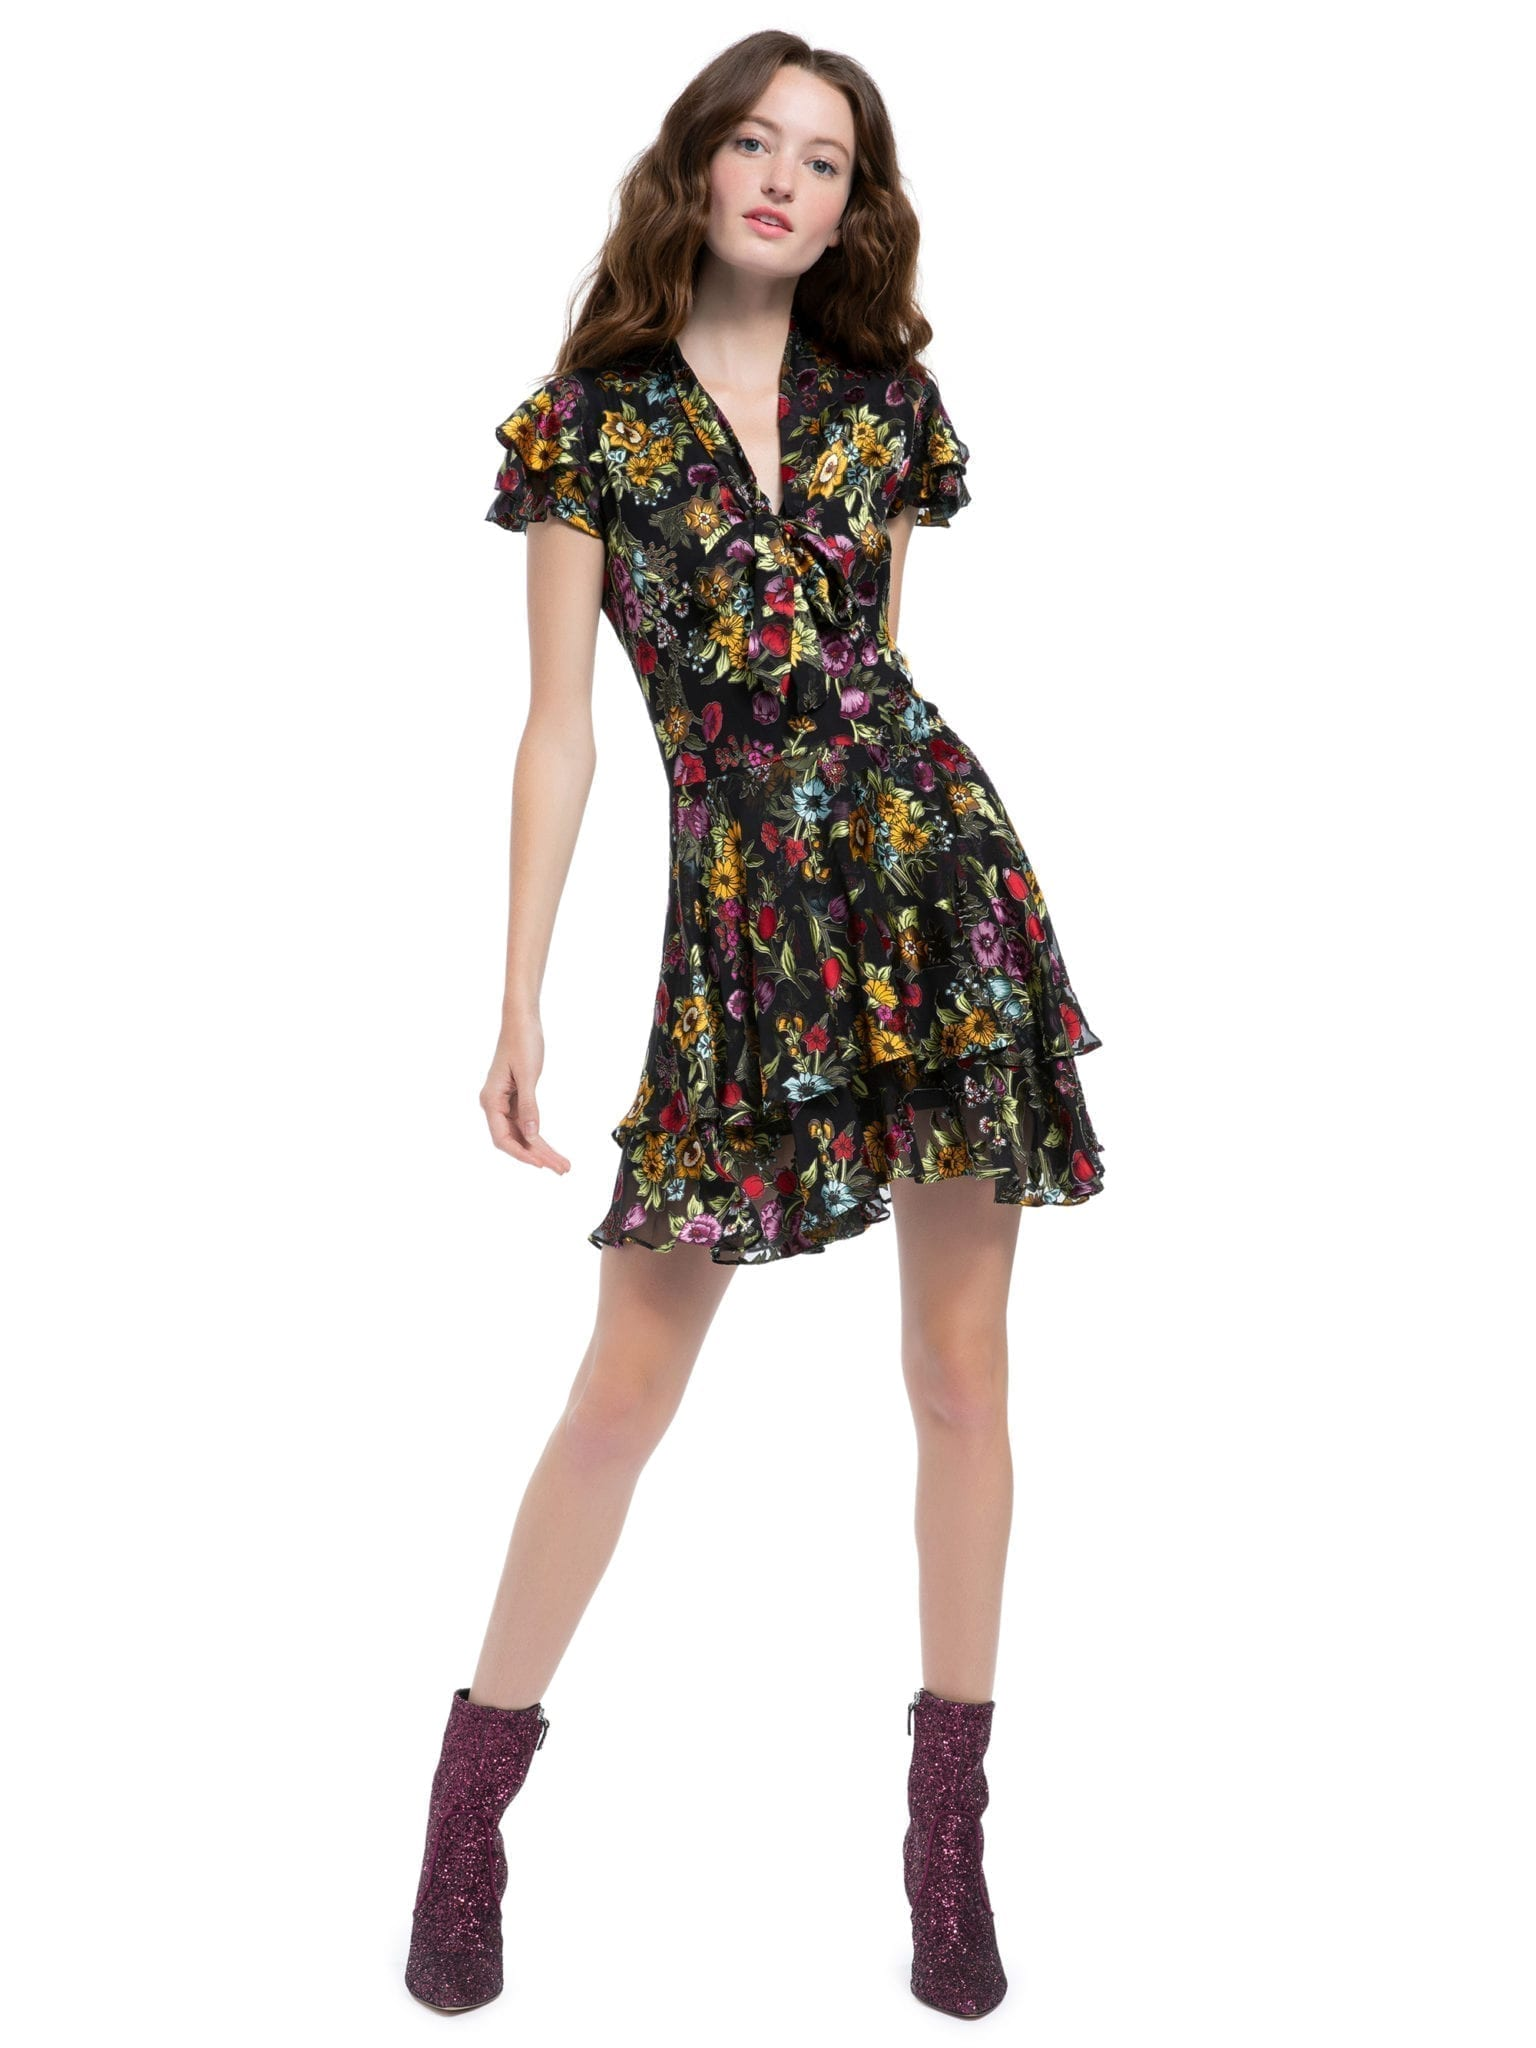 aaf9380c911e Alice + Olivia Moore Floral Black Dress - We Select Dresses